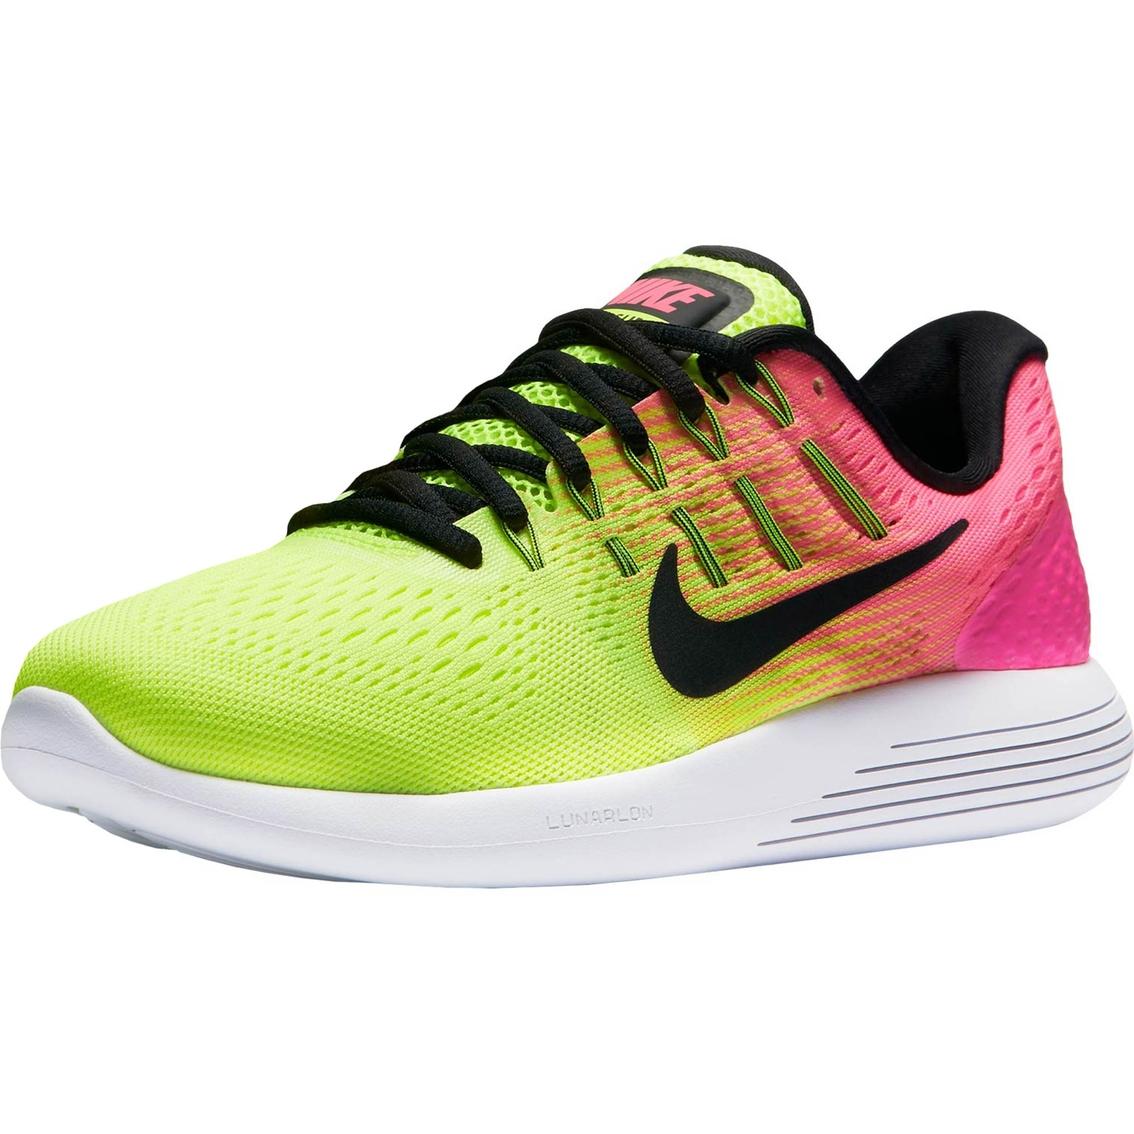 Nike Women's Lunarglide 8 Oc Running Shoes